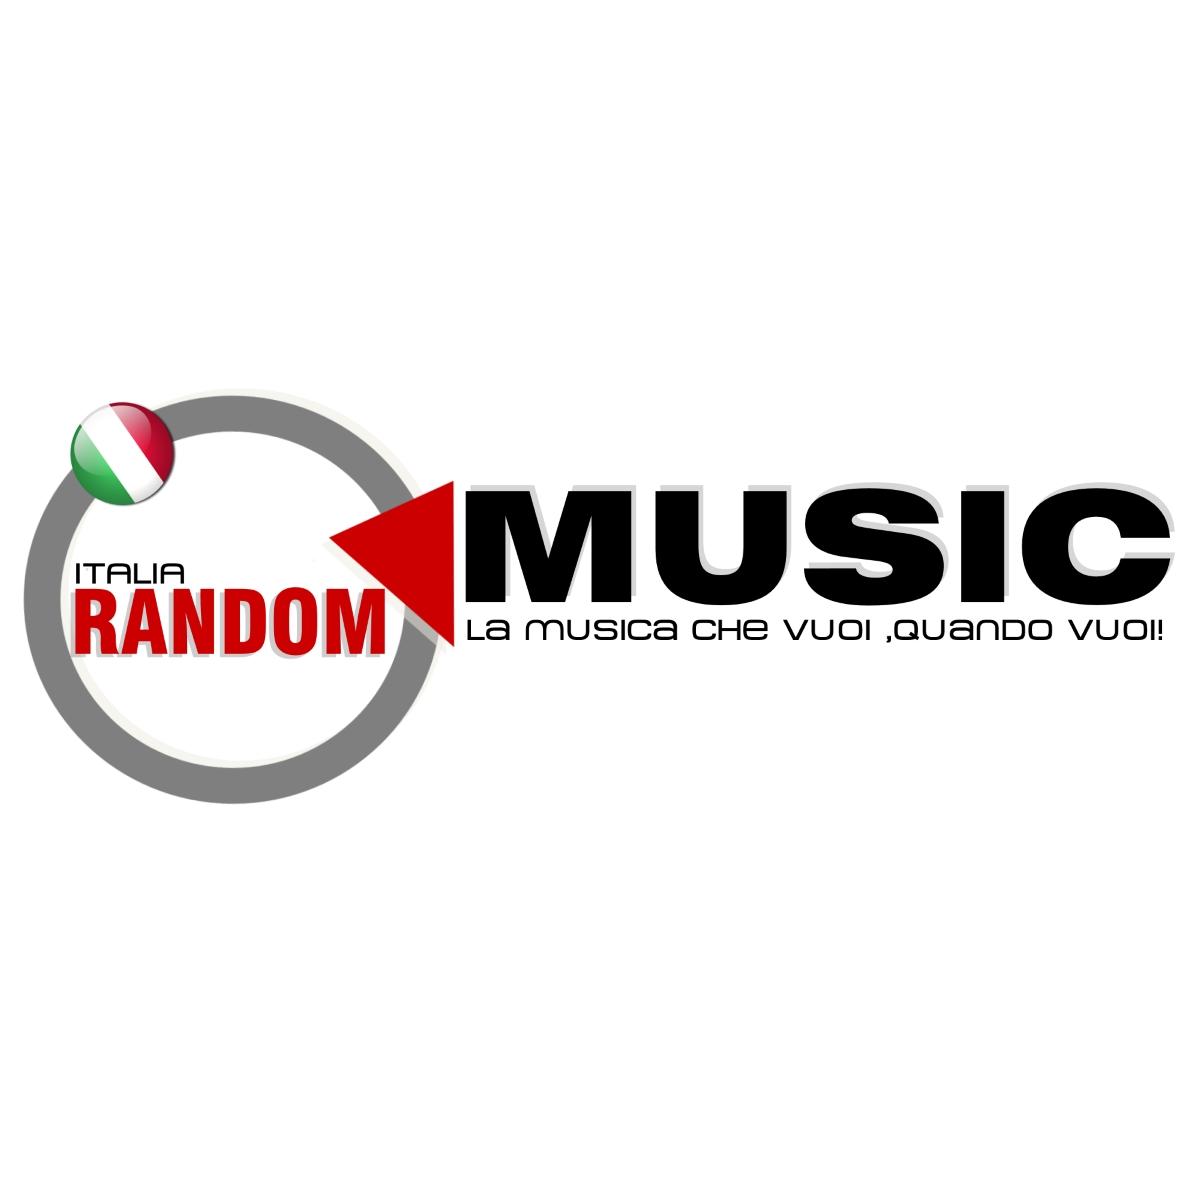 Italia Random Music